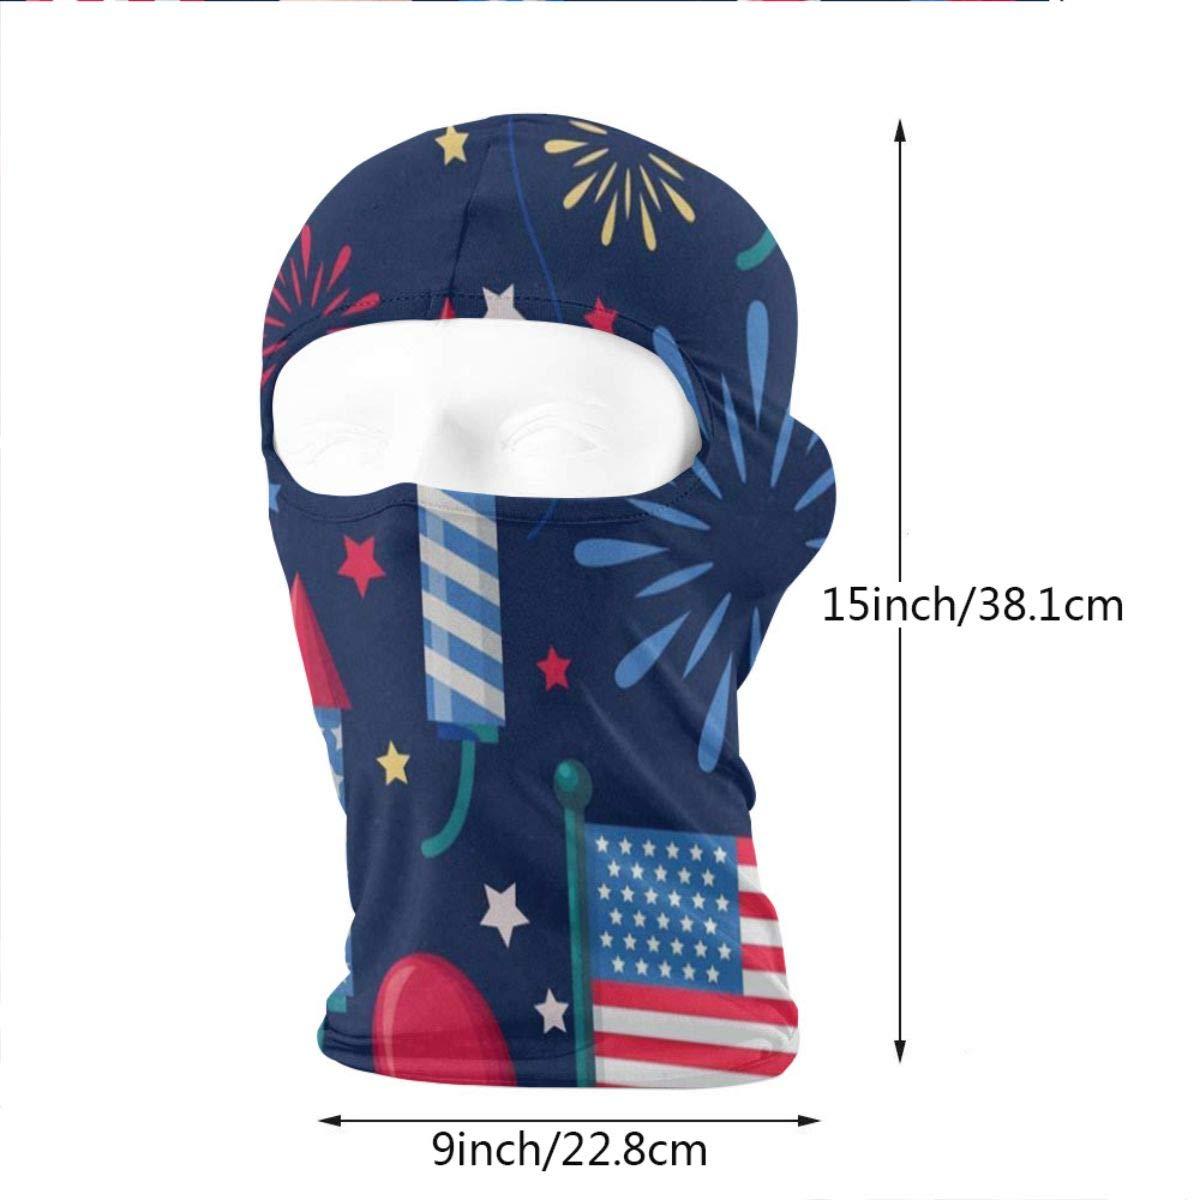 Balaclava USA Holiday Navy Firework Full Face Masks UV Protection Ski Hat Womens Neck Warmer for Cycling